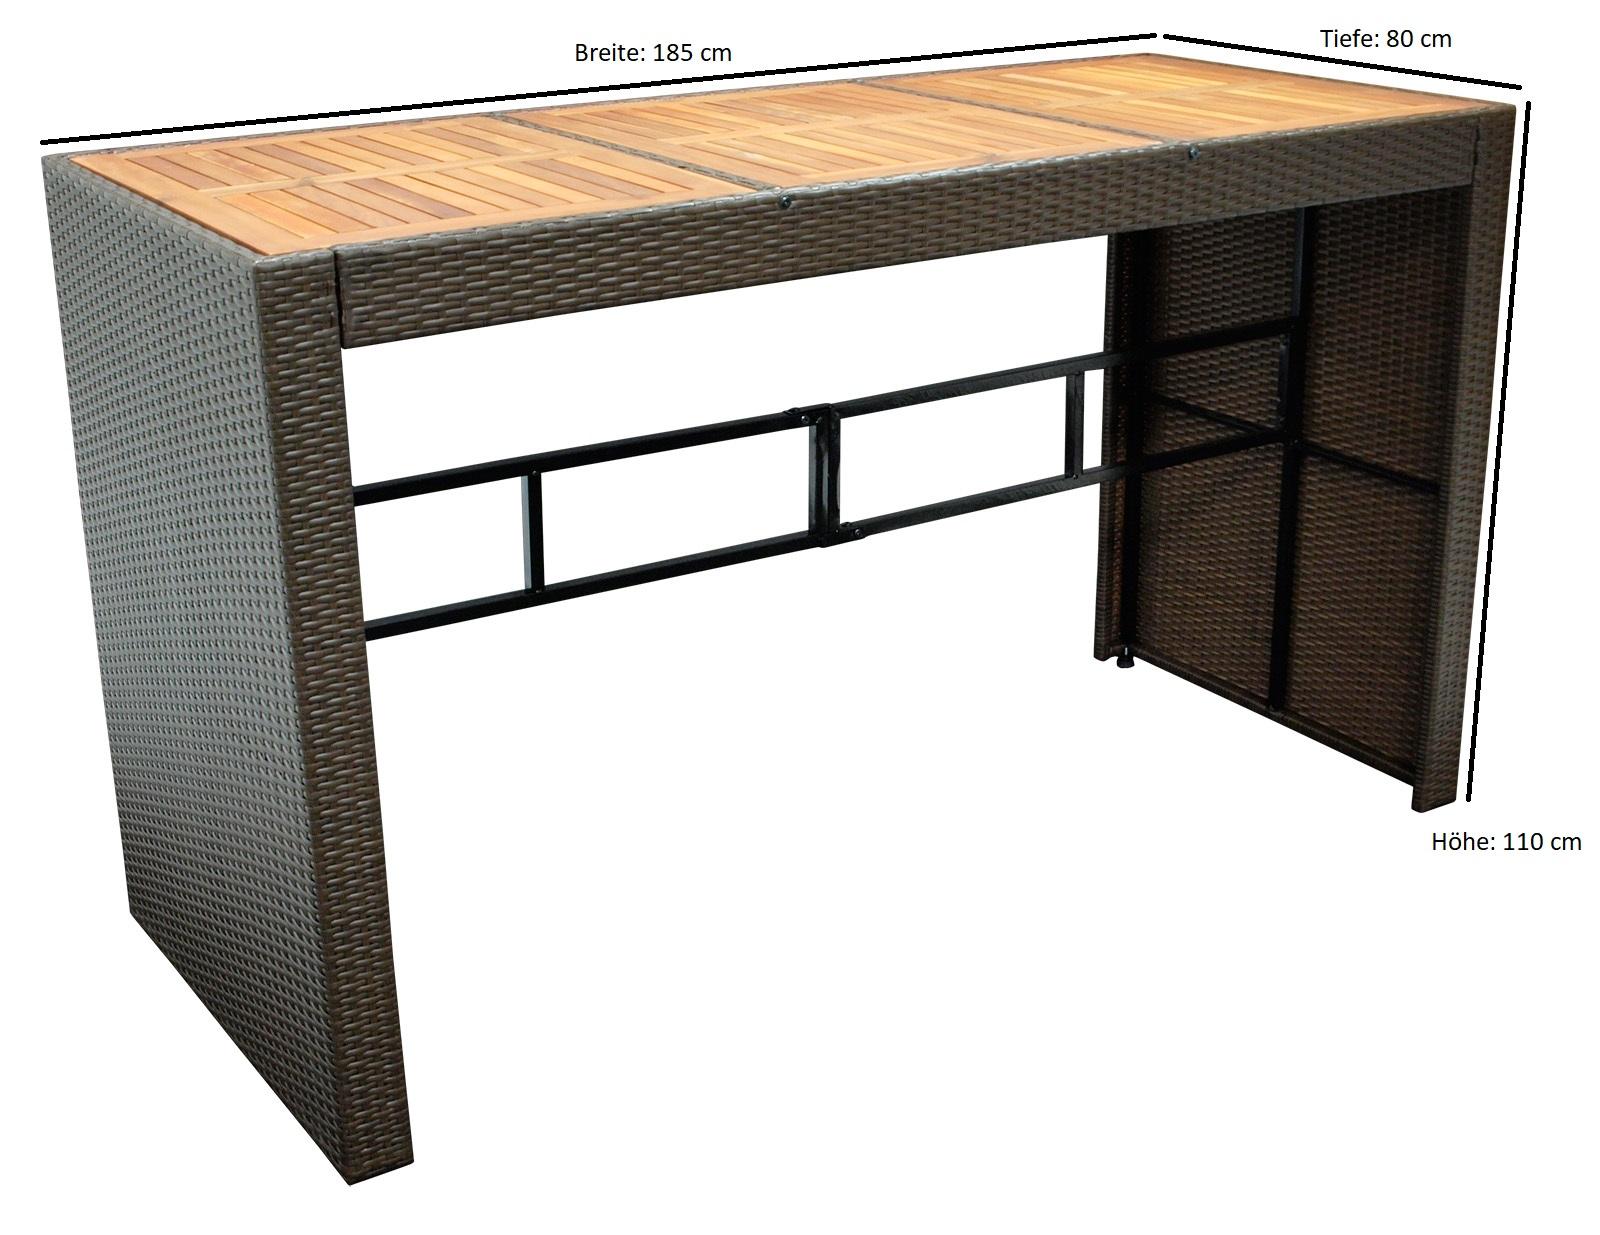 Bartisch CORTINA 185x80x110cm, Geflecht braun + Akazienholz